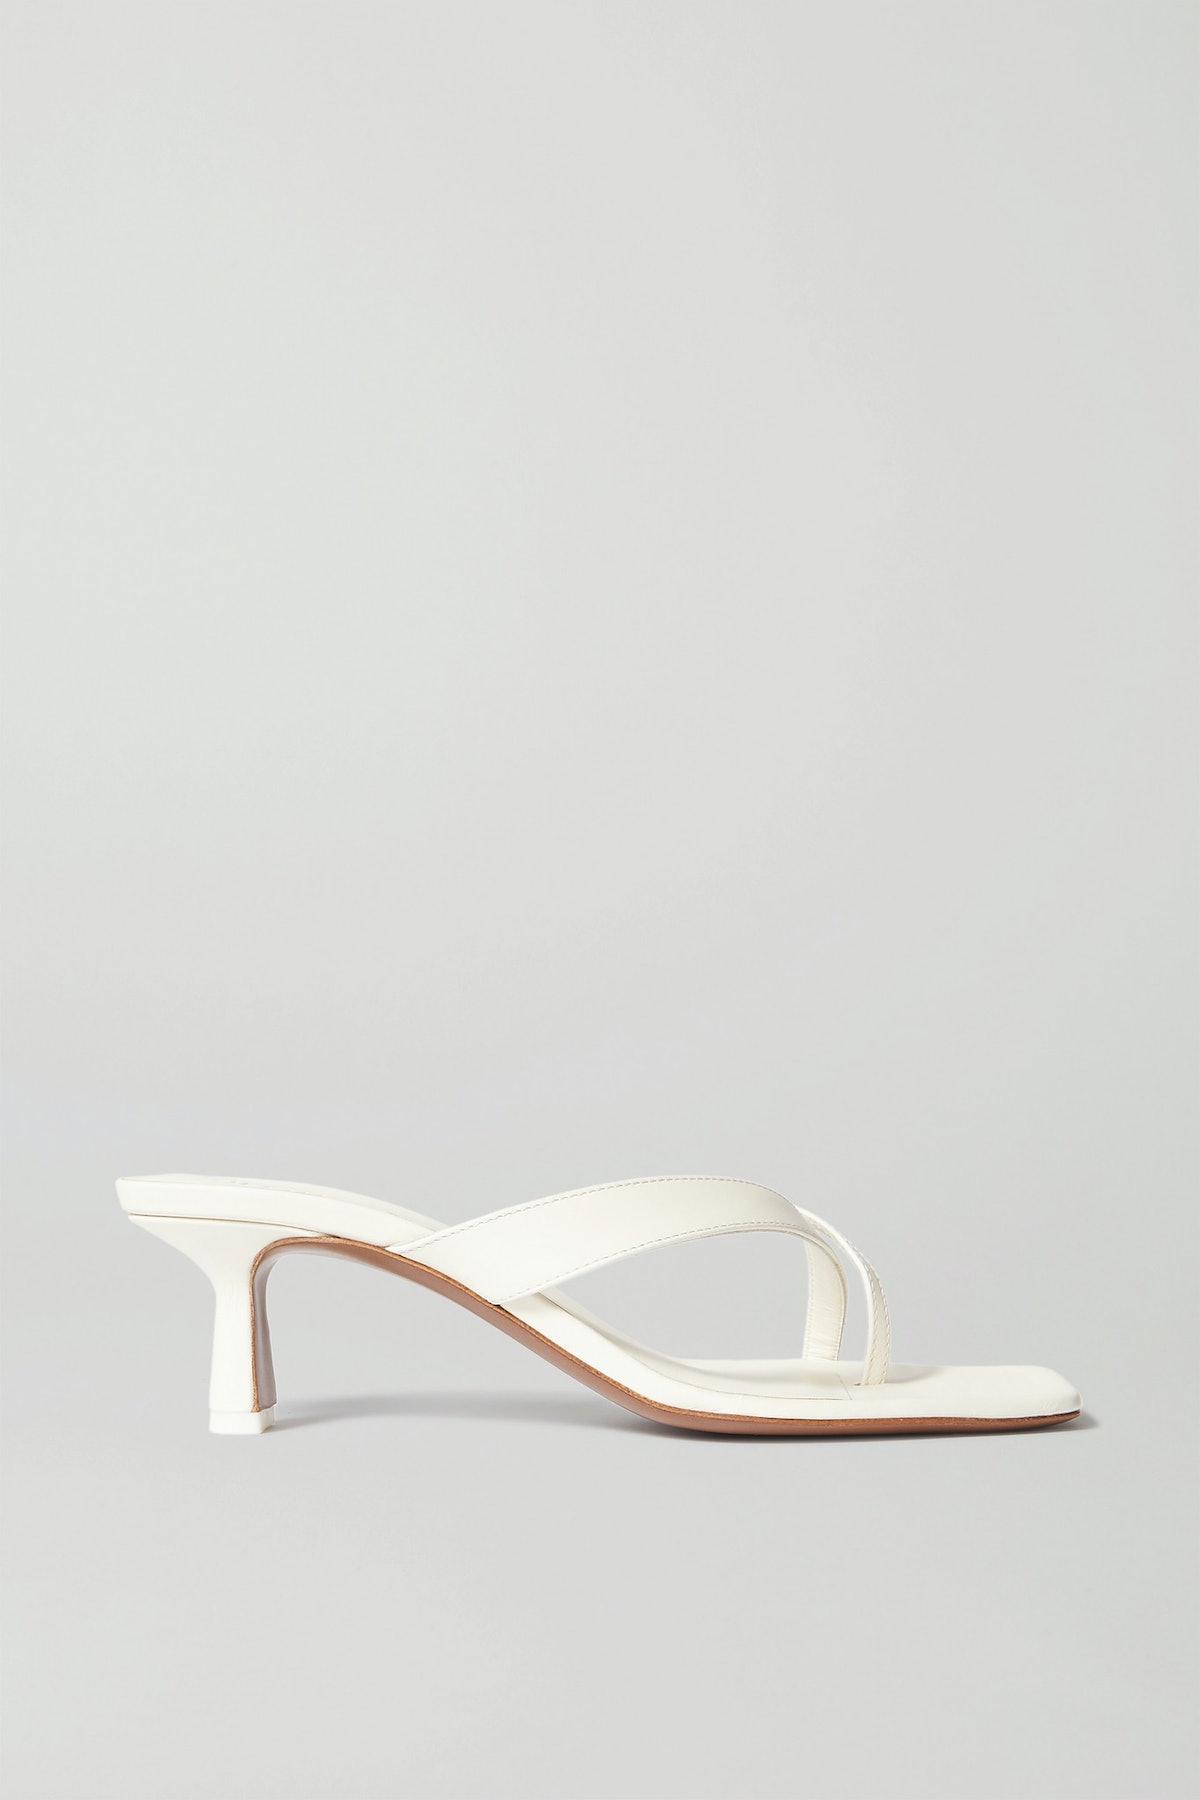 Florae Leather Sandals